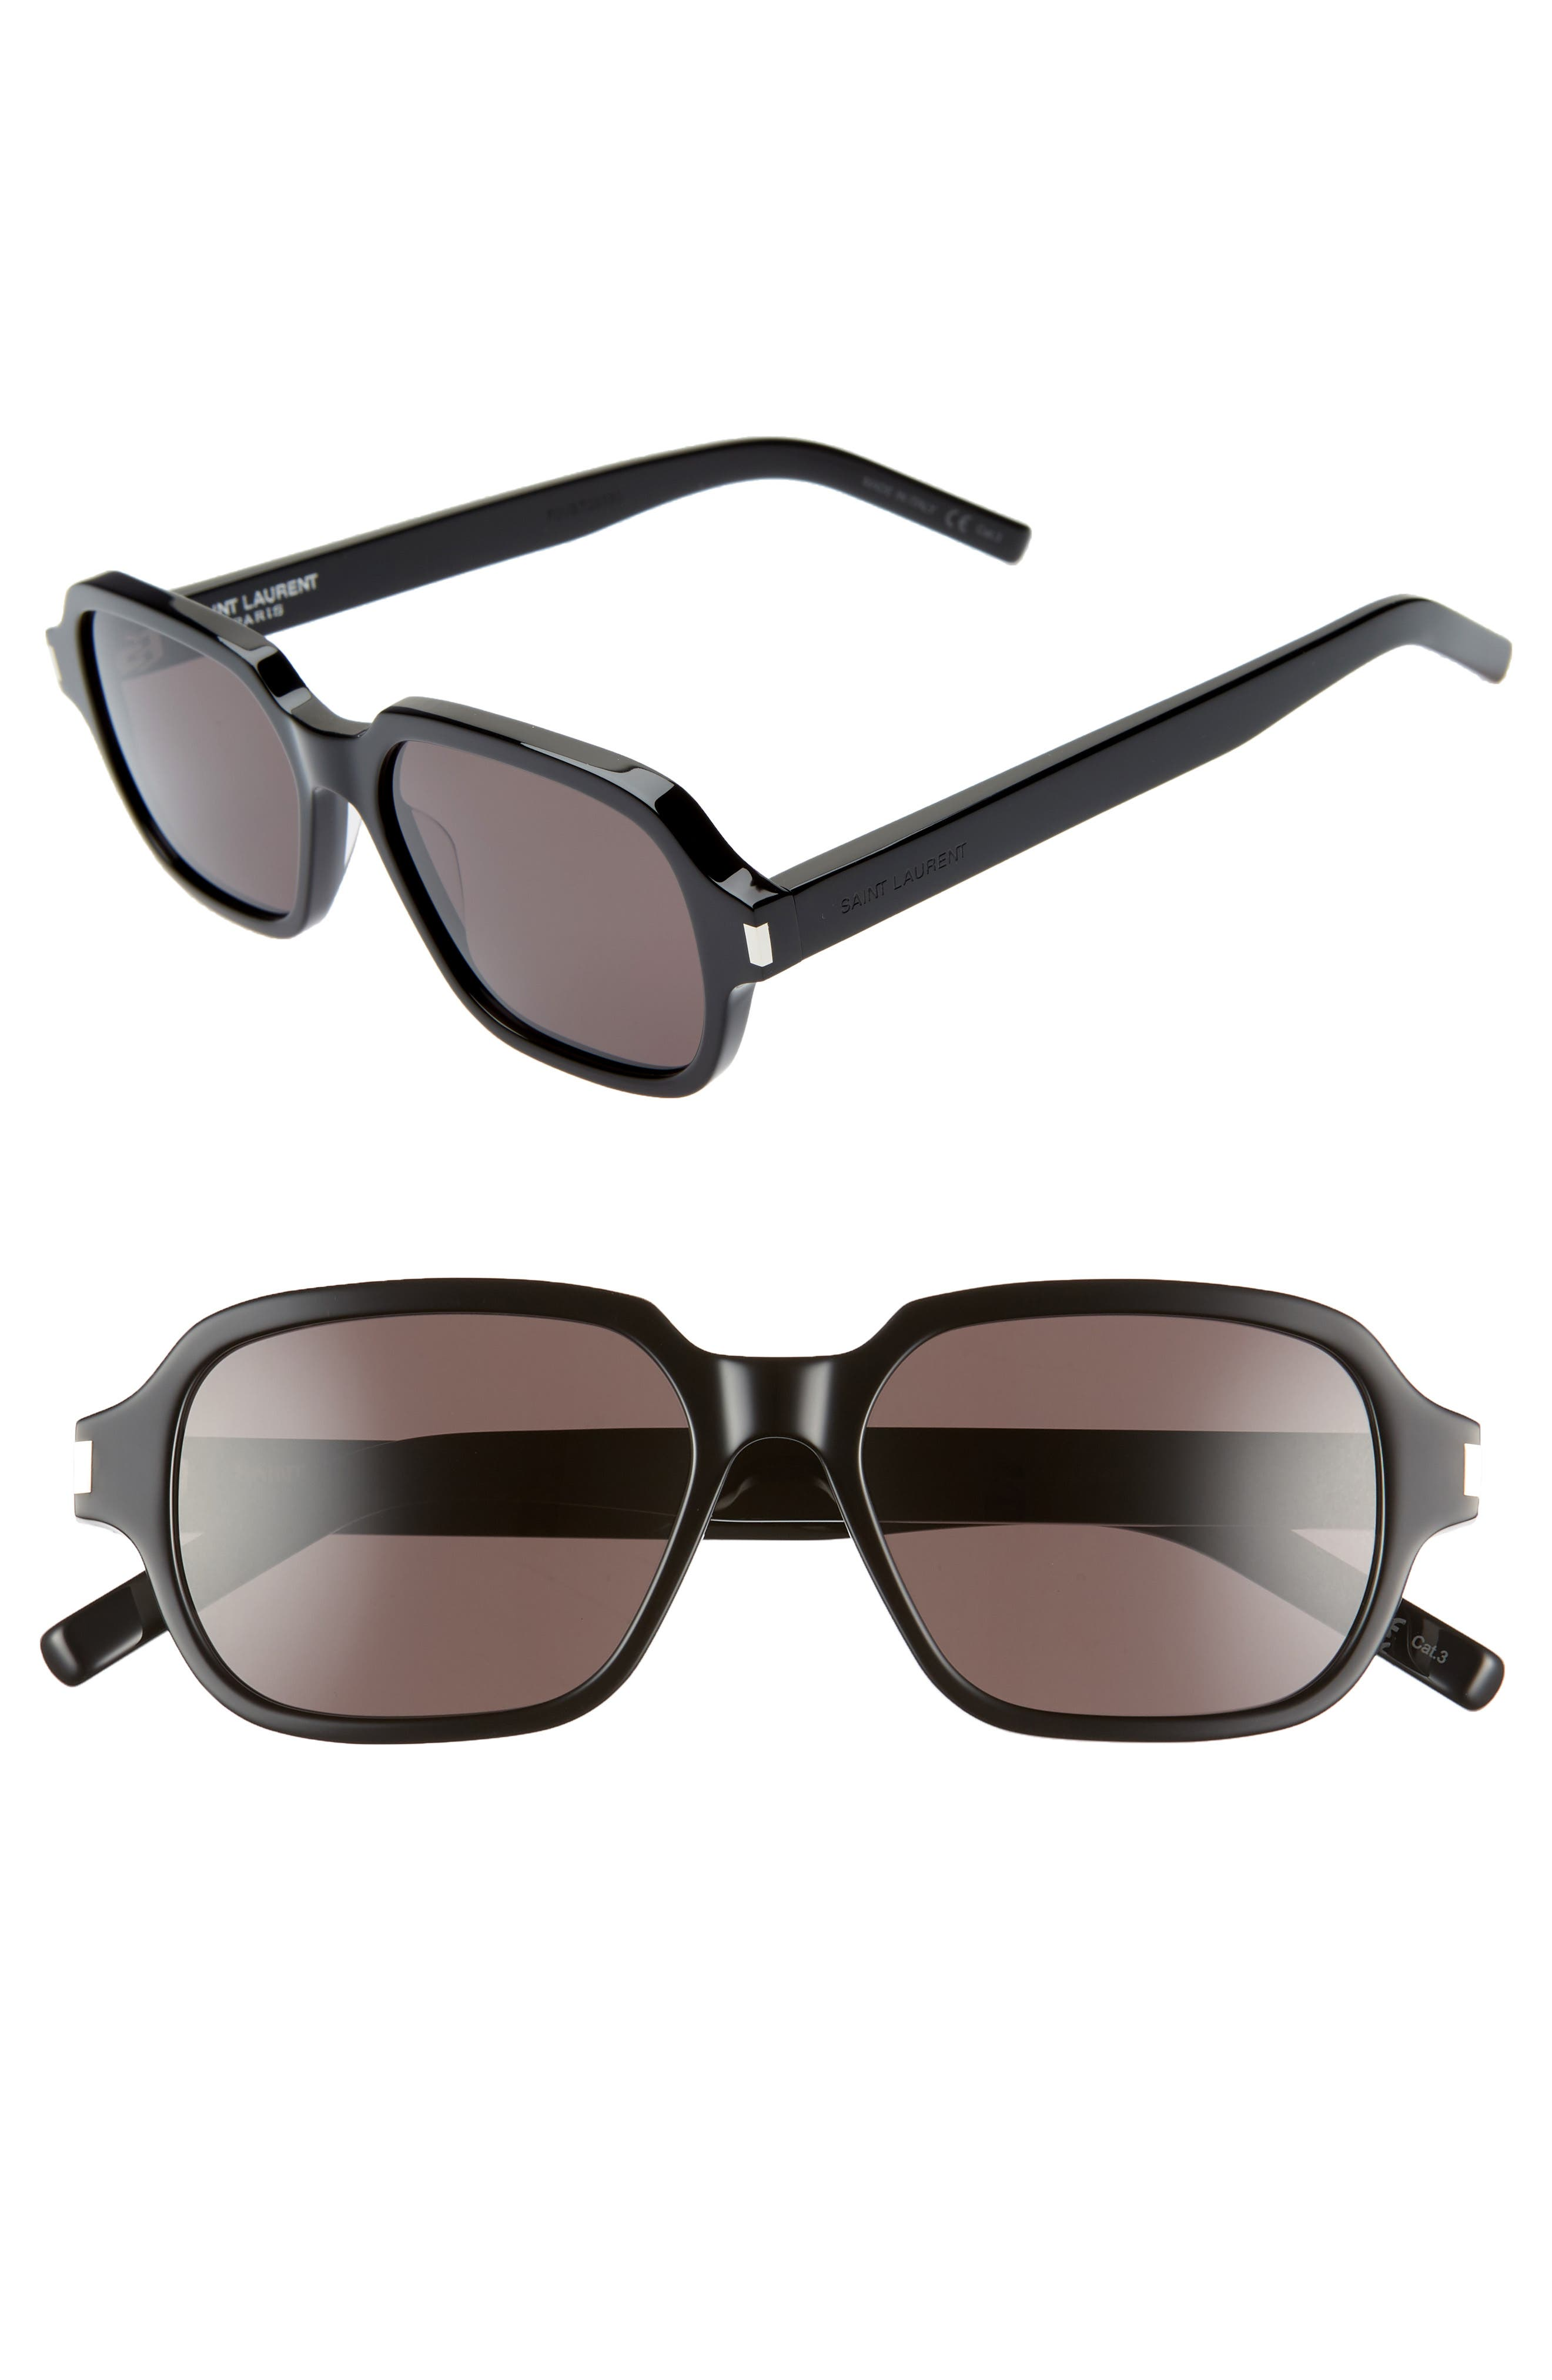 SAINT LAURENT 53mm Rectangle Sunglasses, Main, color, SHINY BLACK/ GREY SOLID